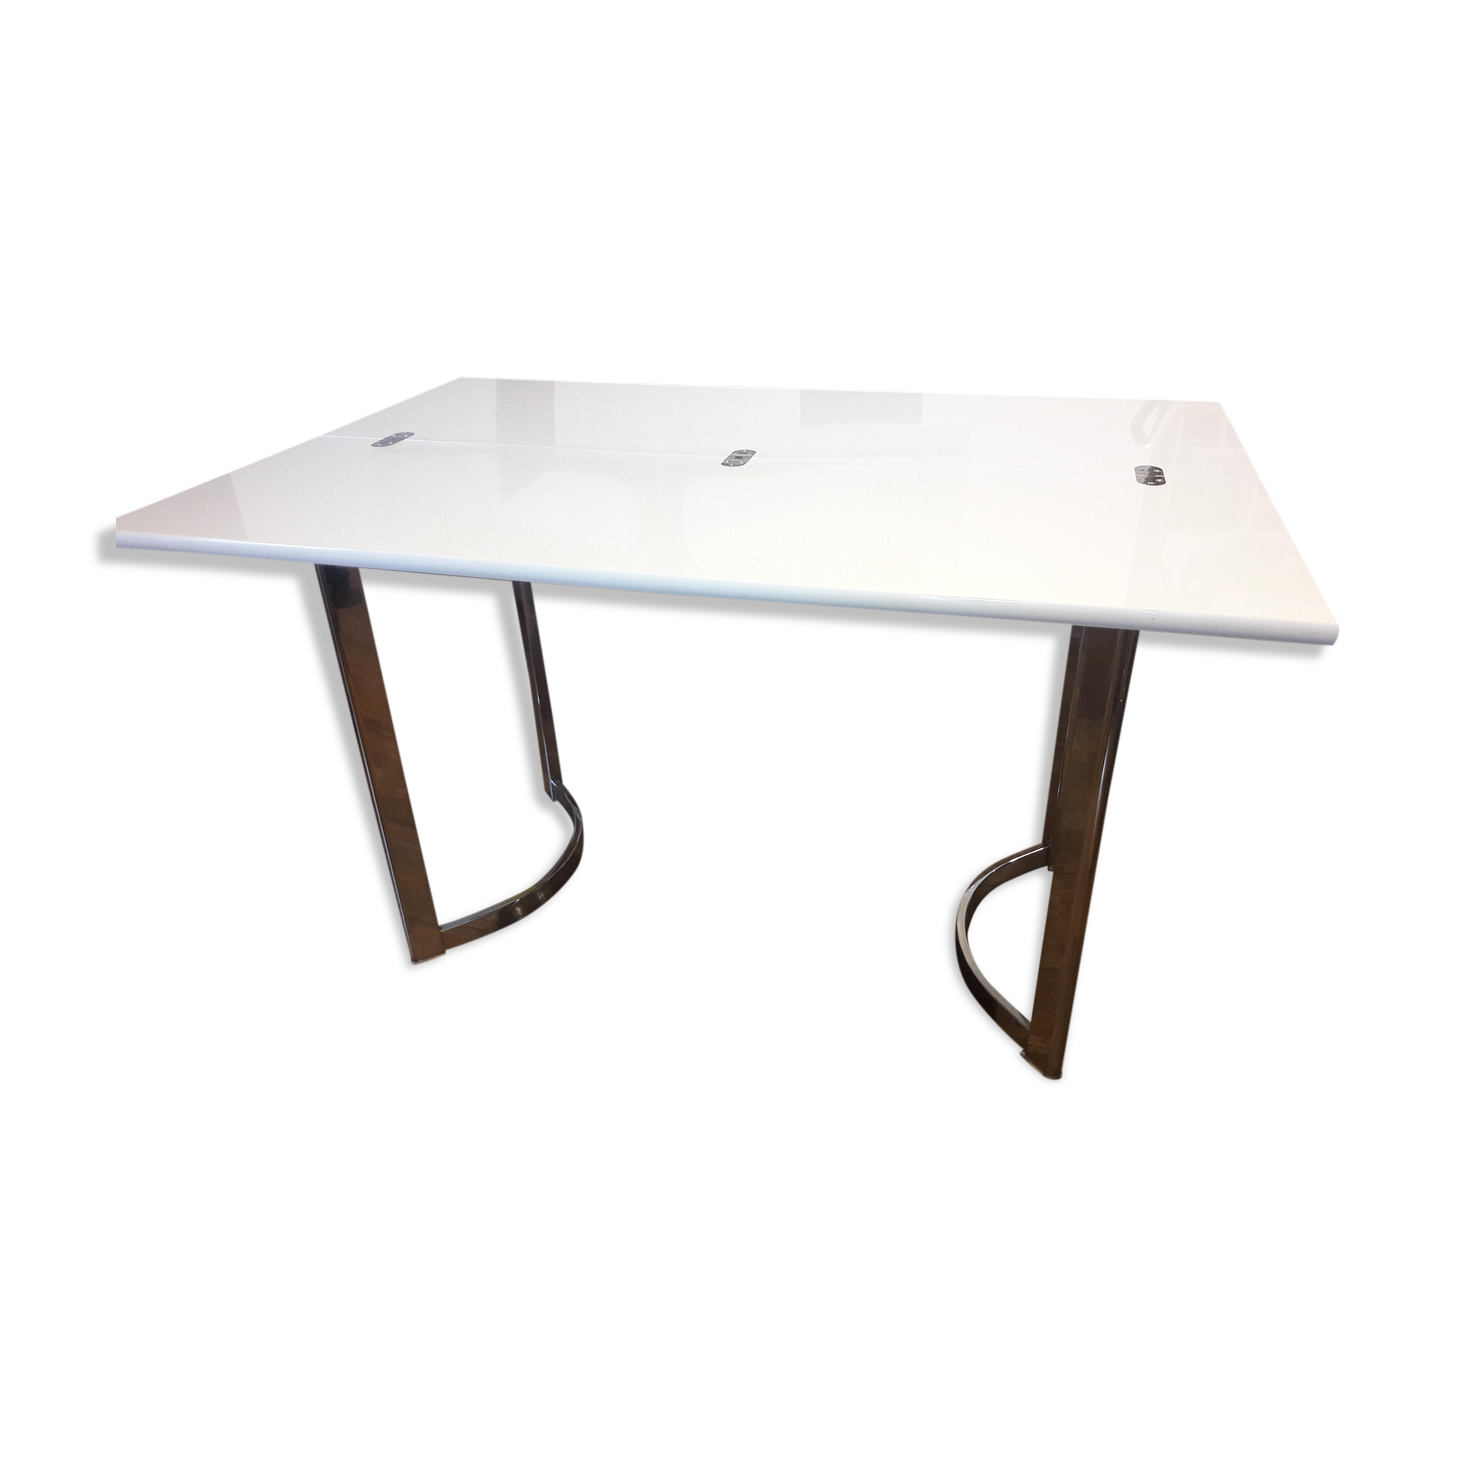 Table console pliante calligaris